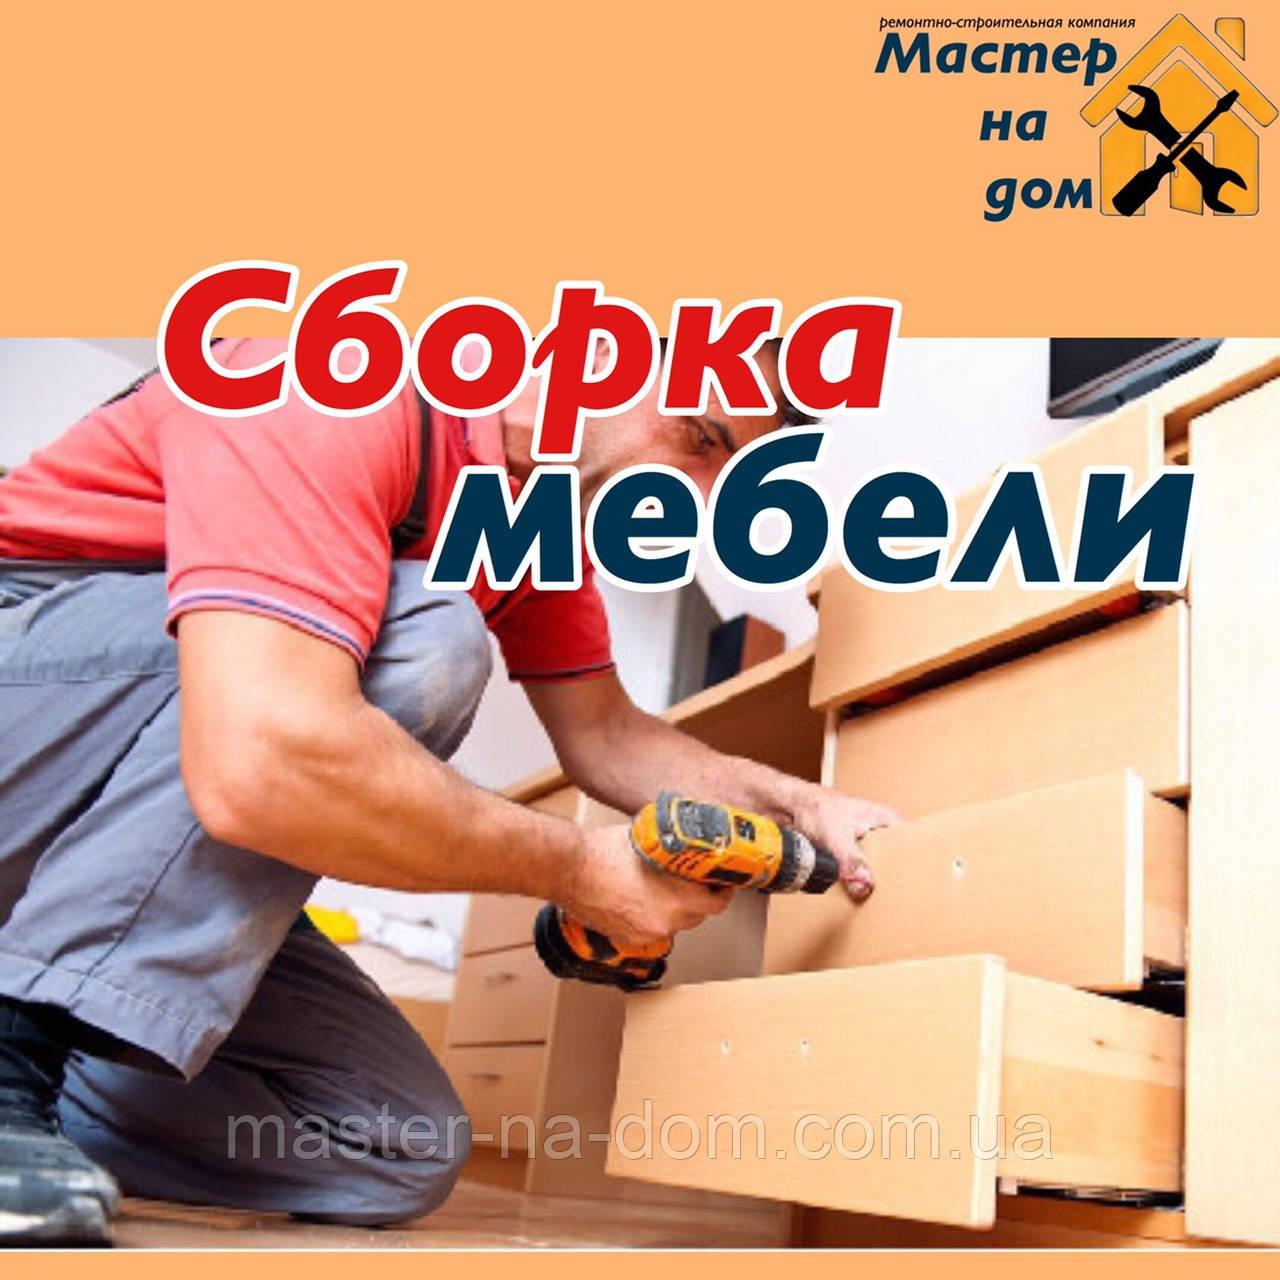 Сборка мебели в Николаеве